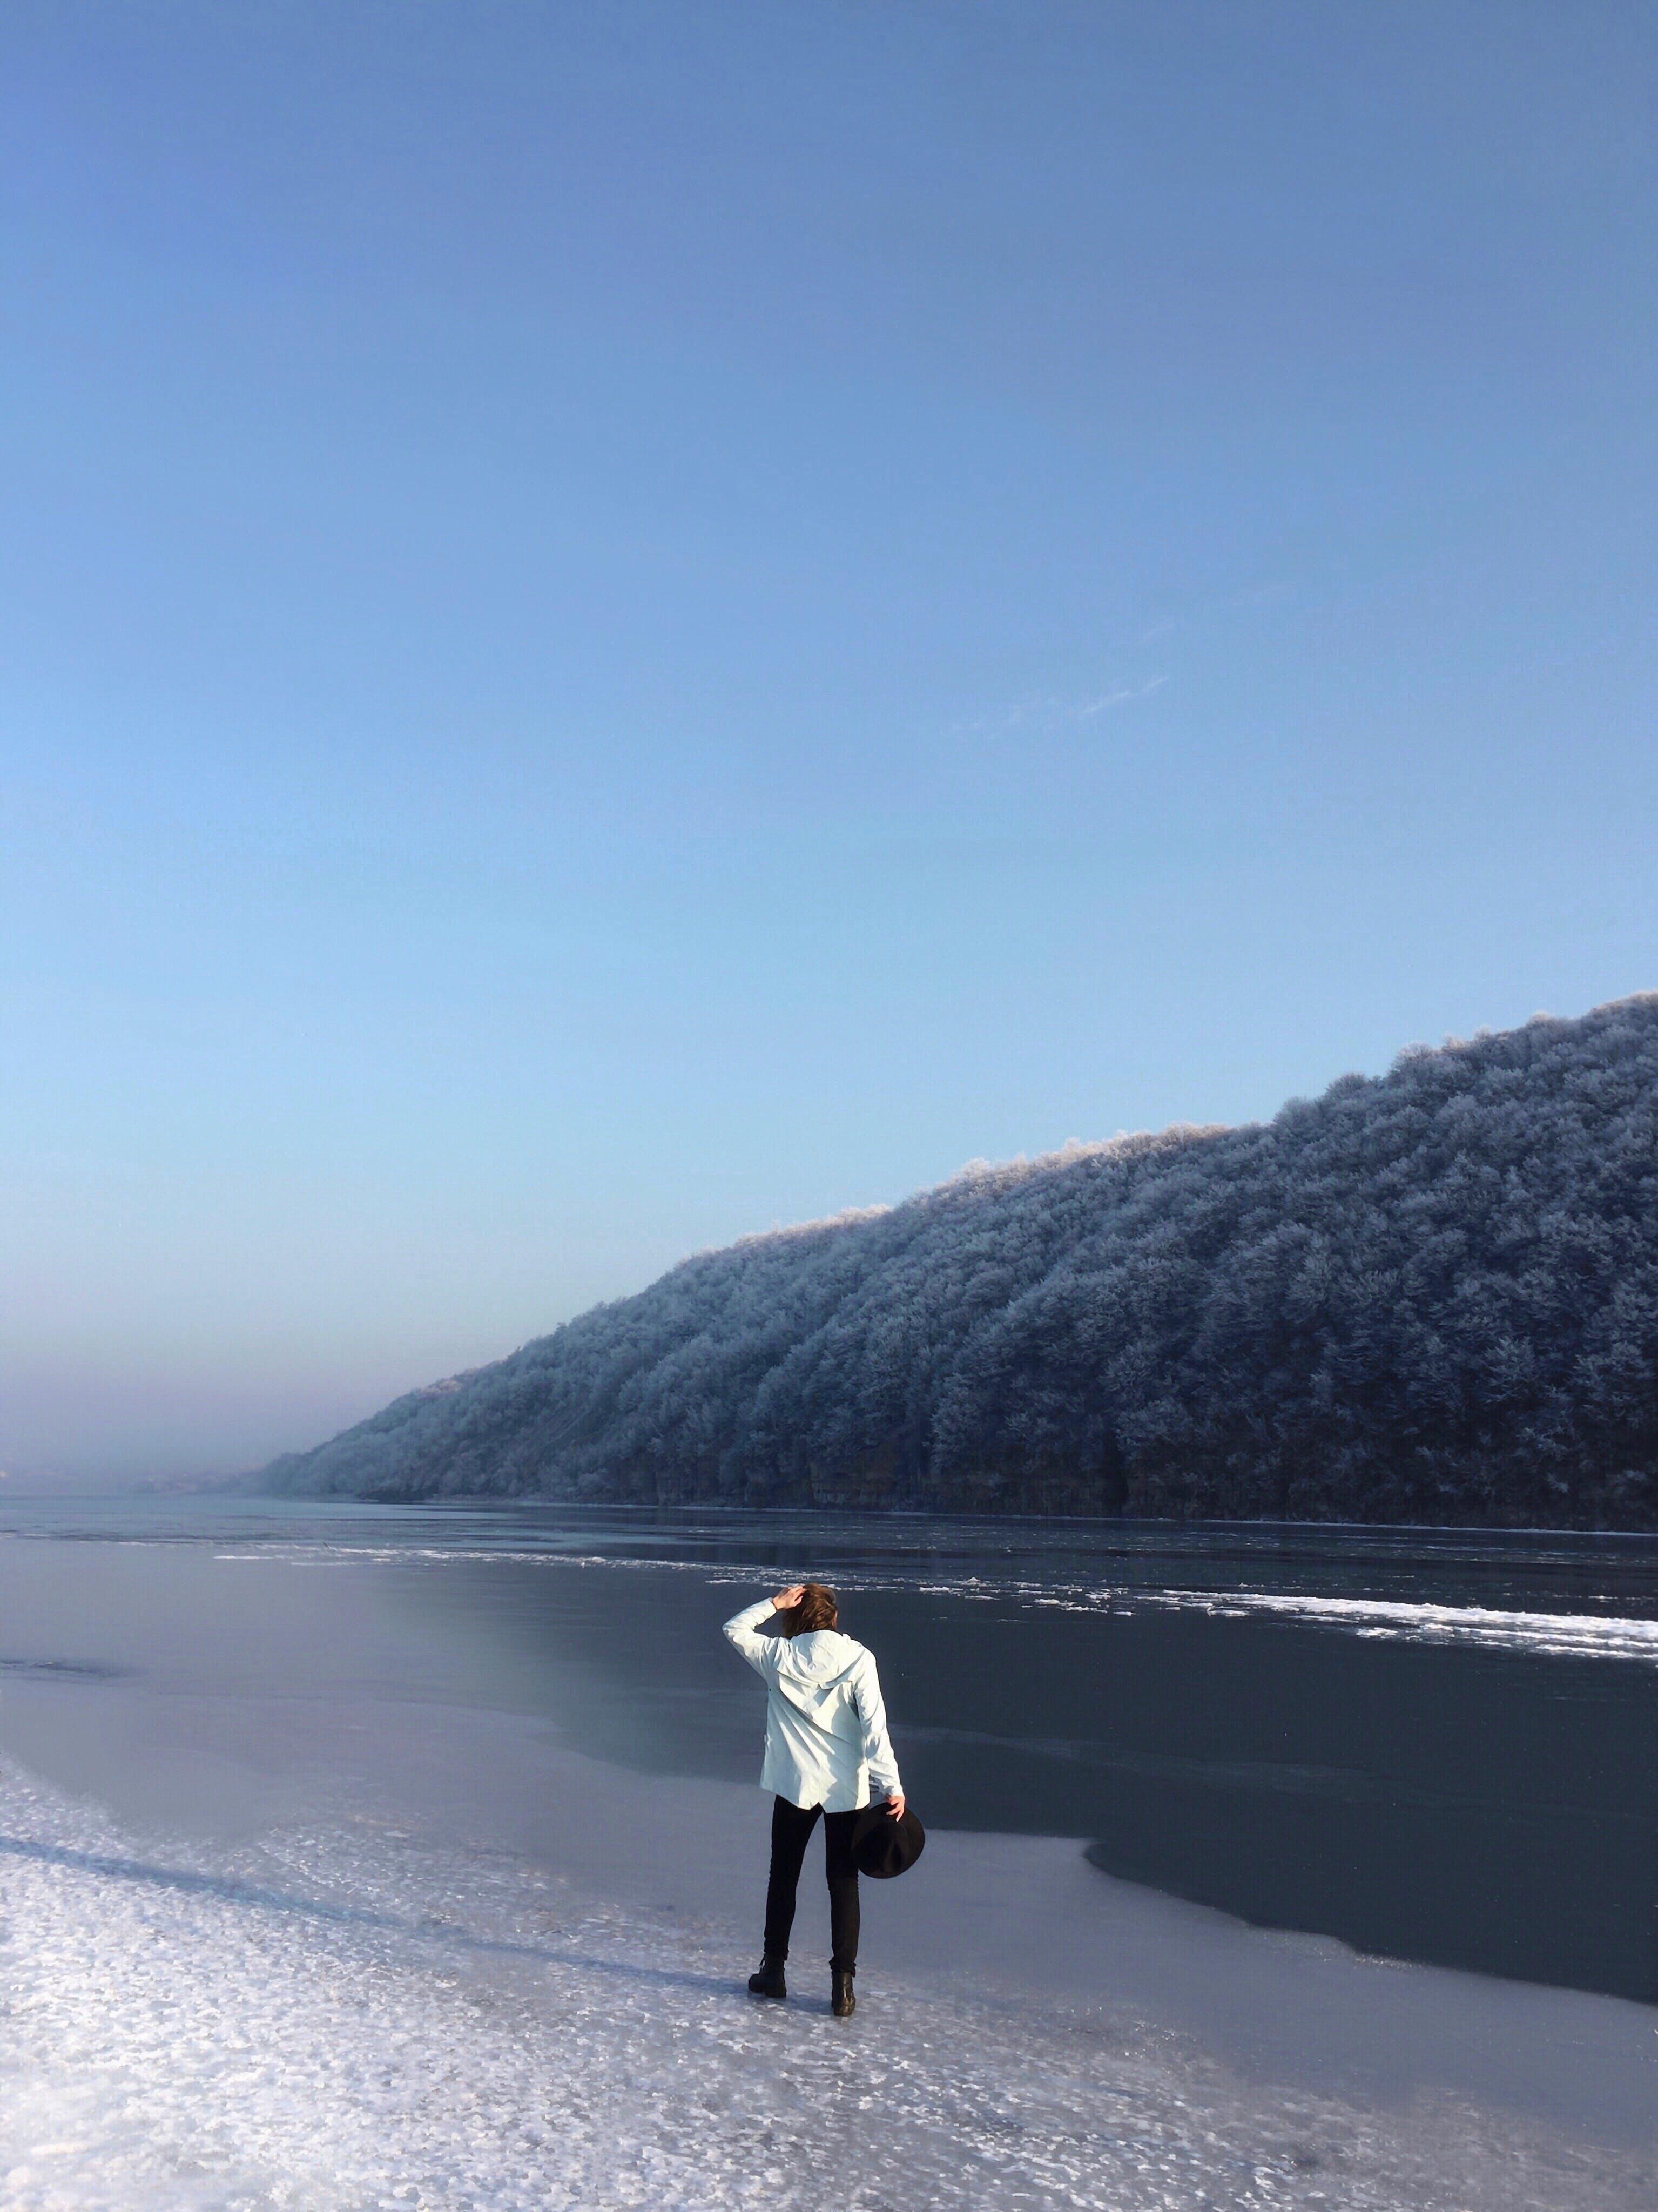 Free stock photo of daylight, daytime, lake, mobilechallenge